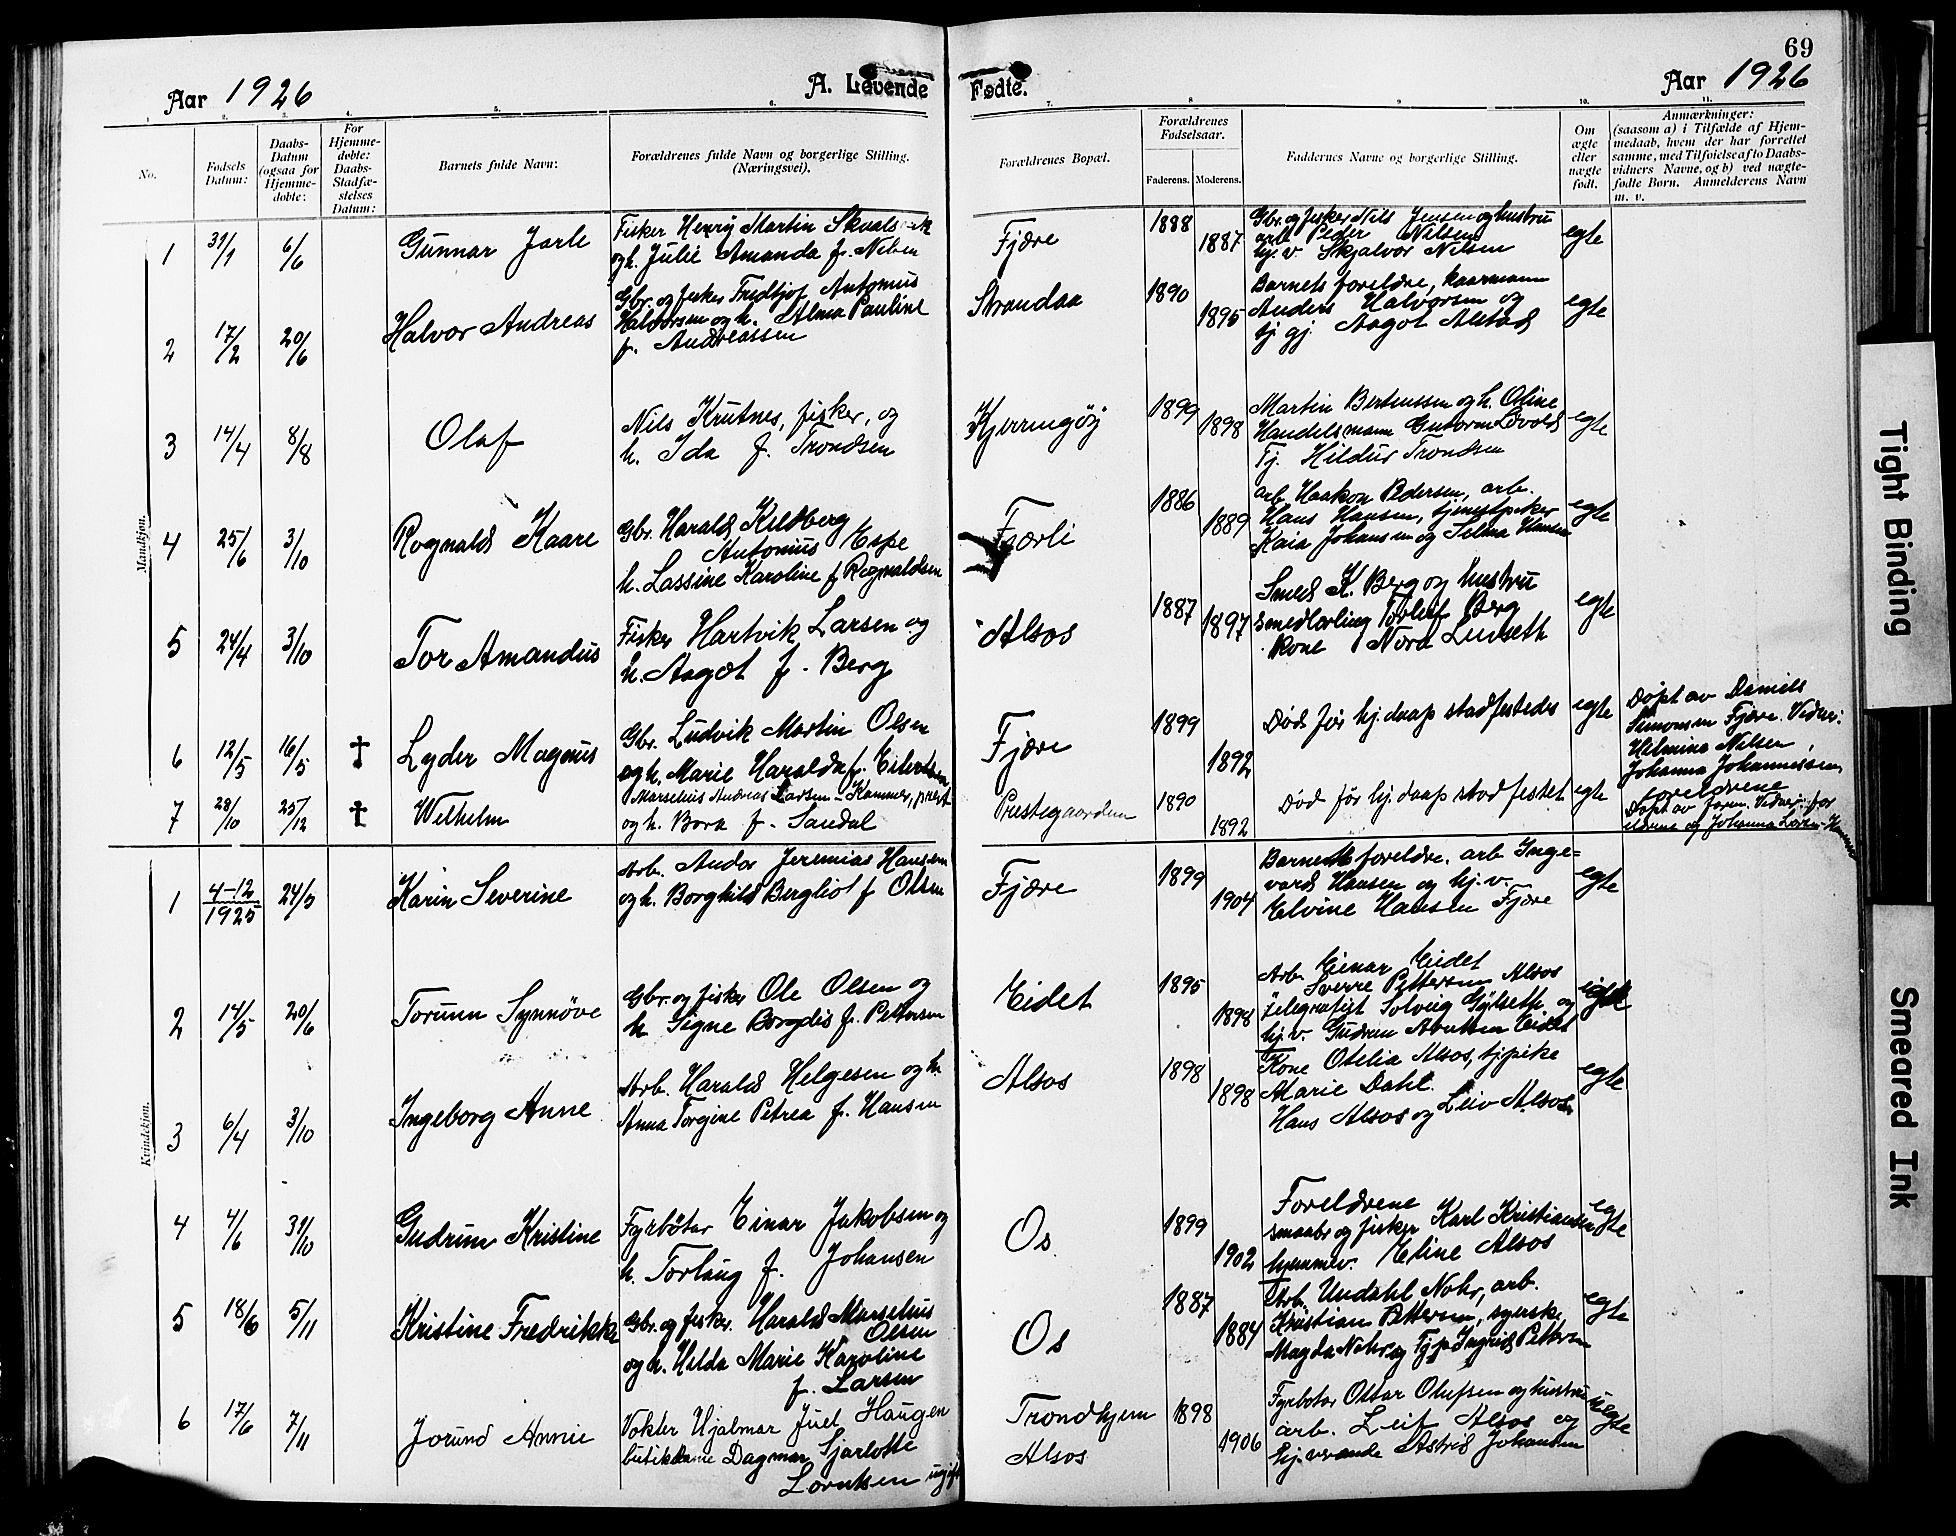 SAT, Ministerialprotokoller, klokkerbøker og fødselsregistre - Nordland, 803/L0077: Klokkerbok nr. 803C04, 1897-1930, s. 69